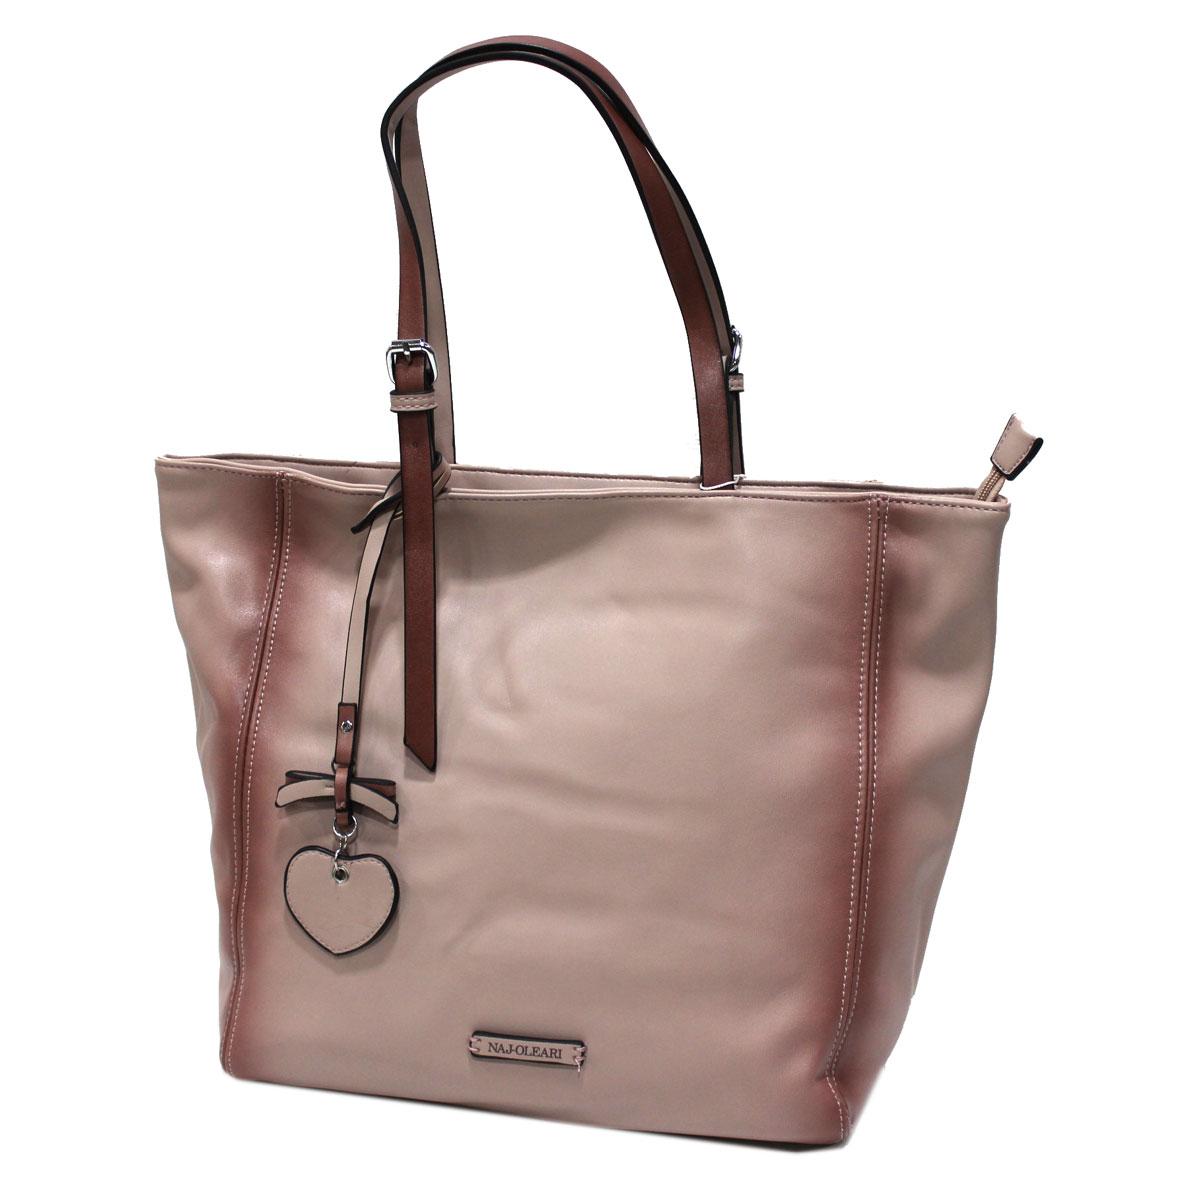 Borsa donna similpelle shopping grande a mano Linea Cloe Naj Oleari 61540  cipria 5b8debb1da4